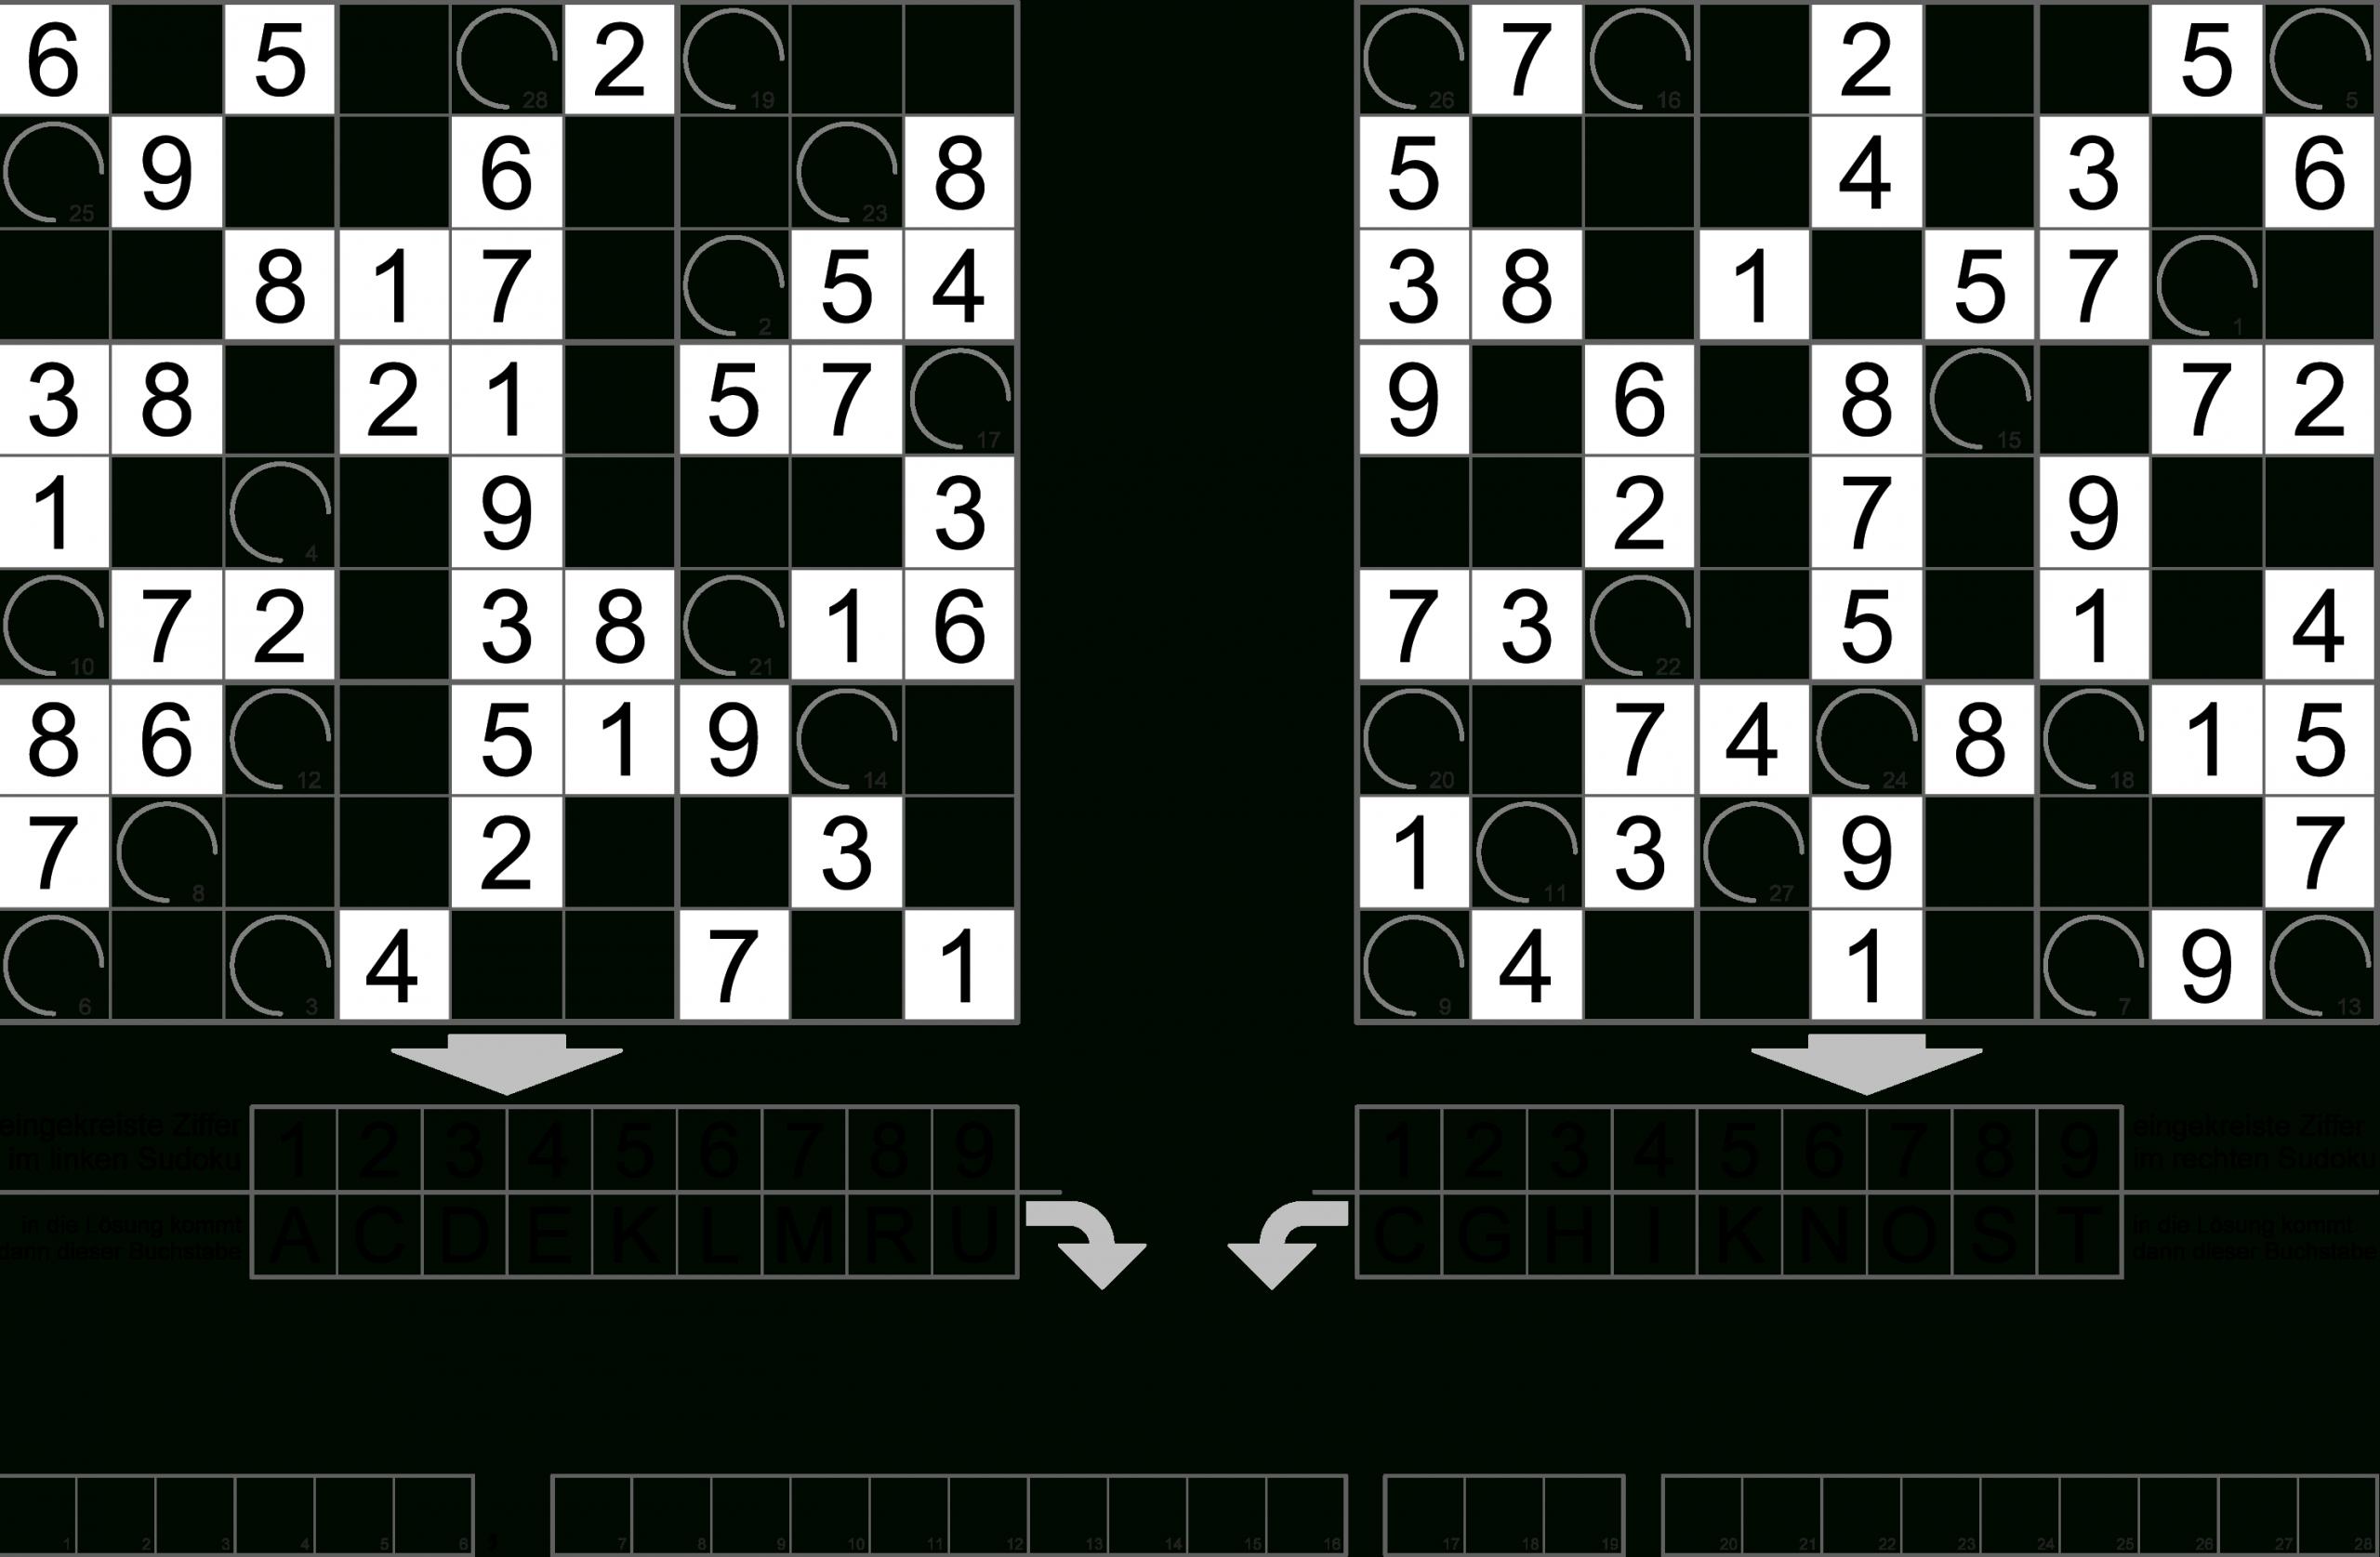 Rätsel-Design - Geschenk-Rätsel Und Geschenk-Sudoku In 2020 verwandt mit Sudoko Rätsel